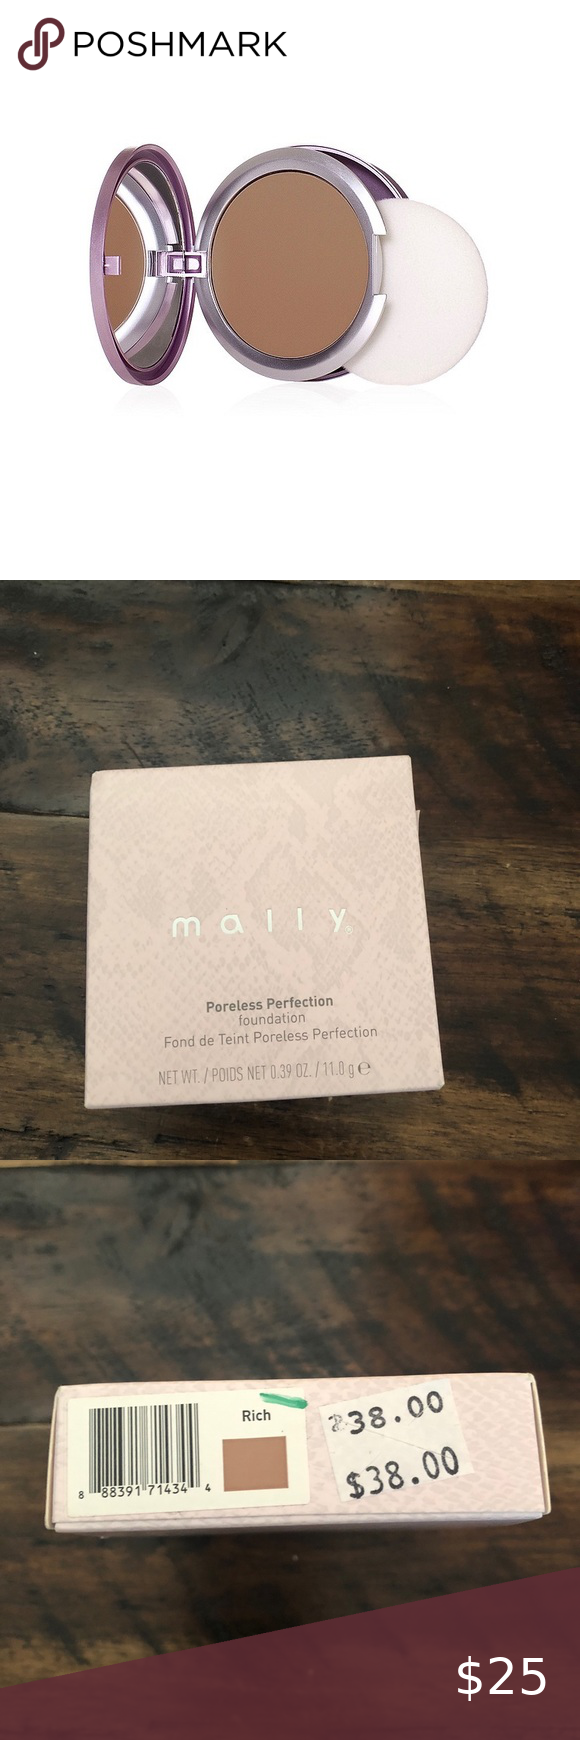 Mally Beauty Poreless Perfection Foundation in 2020